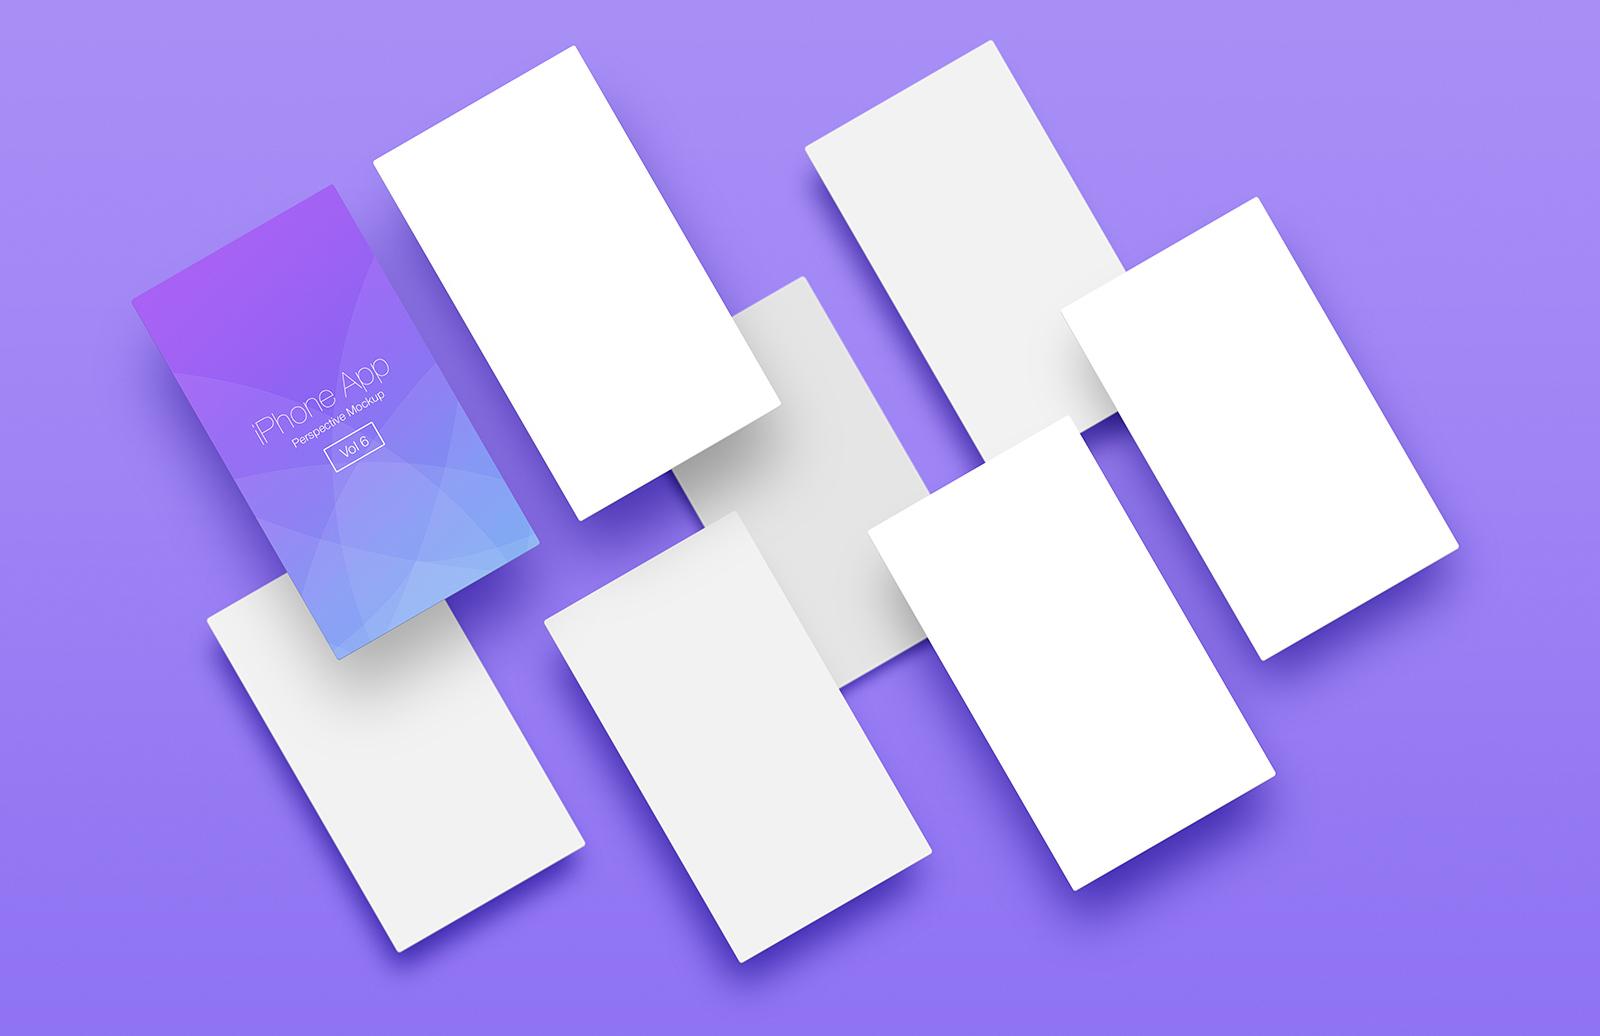 I Phone  App  Perspective  Mockup  Vol 6  Preview 1